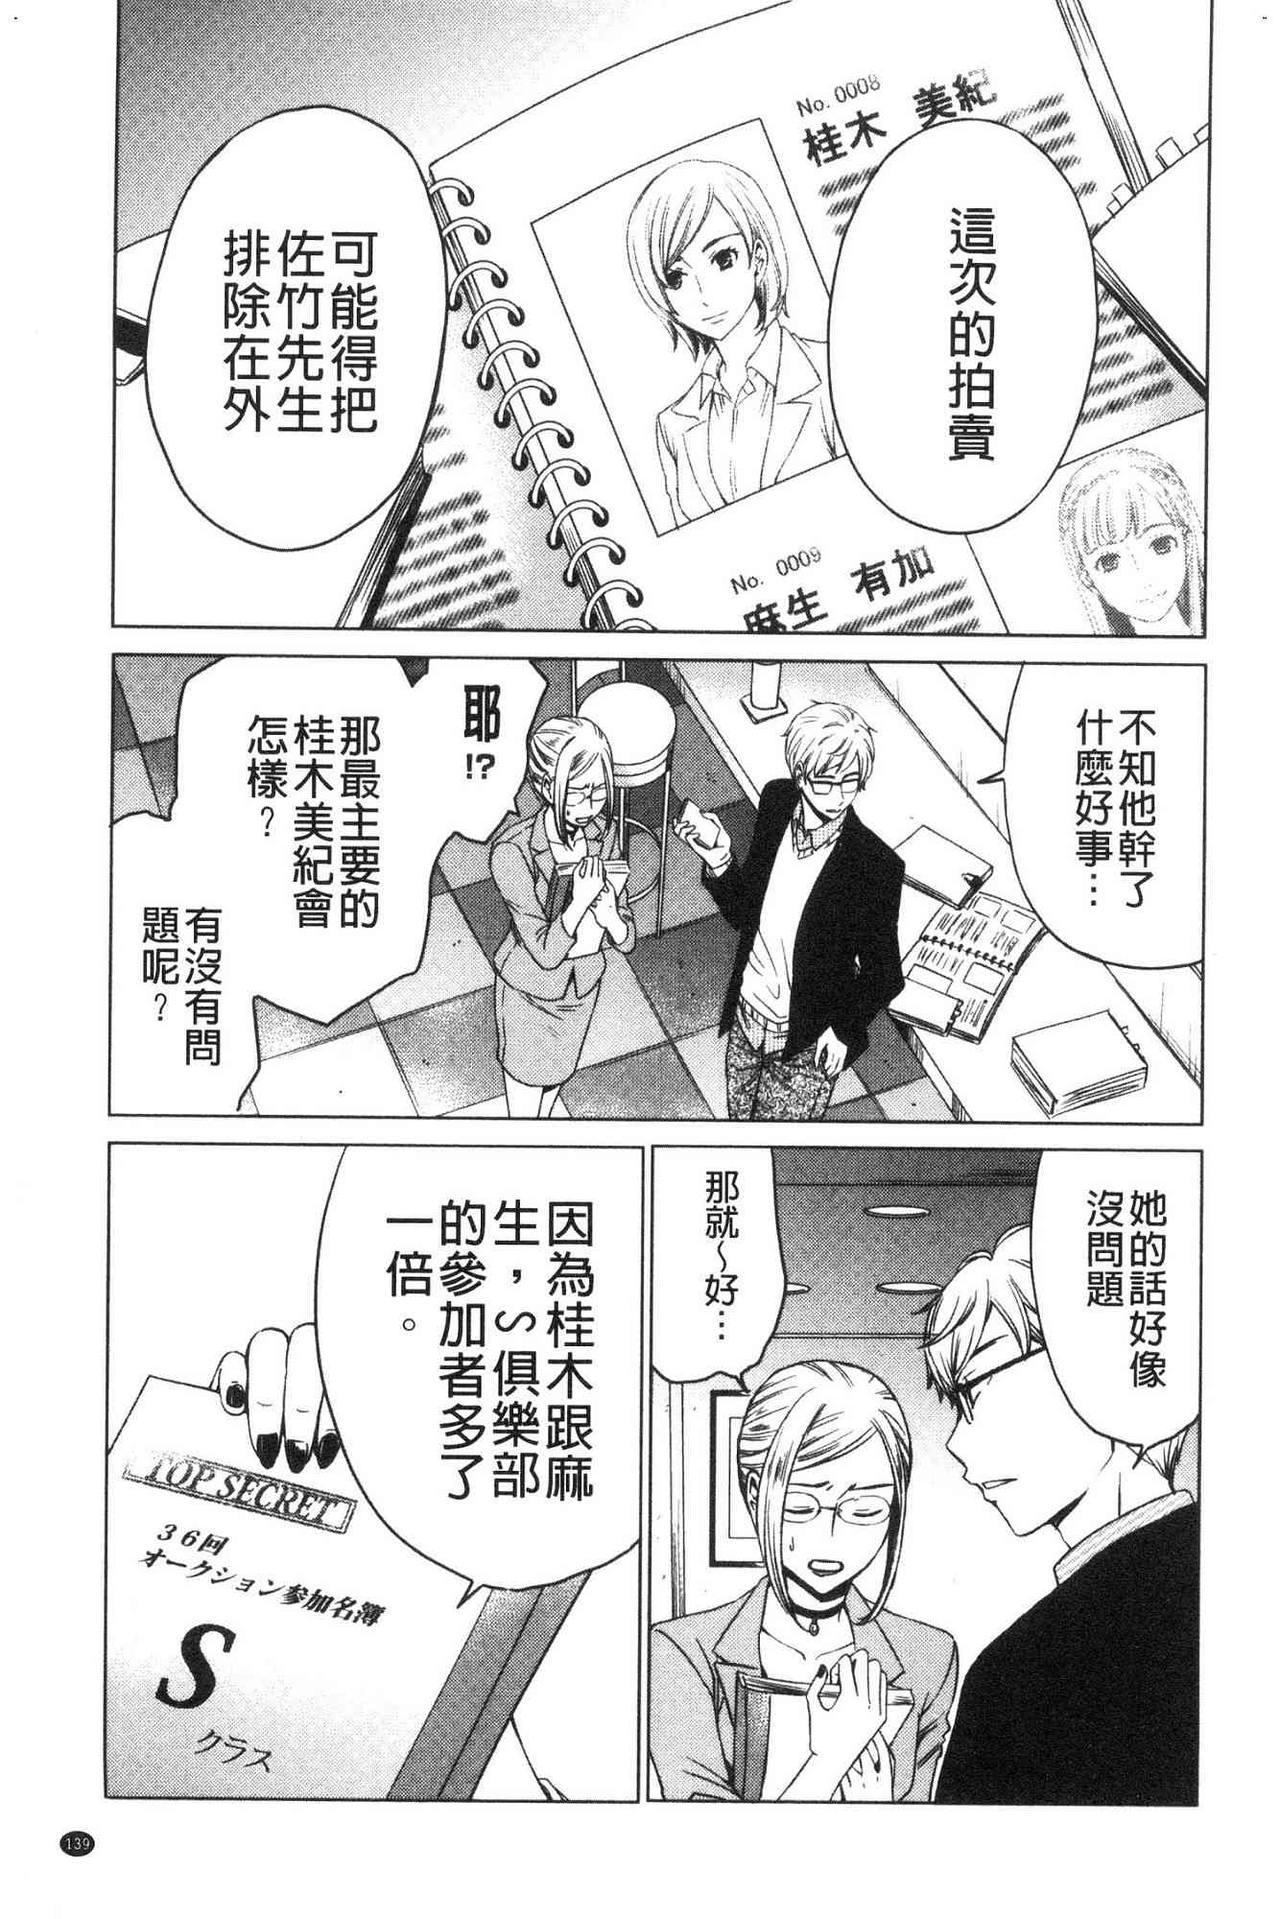 [Gotoh Akira]  21-ji no Onna ~Camera no Mae no Mesuinu~ 2 | 21時之女 ~鏡頭前的牝犬~ 2 [Chinese] 140